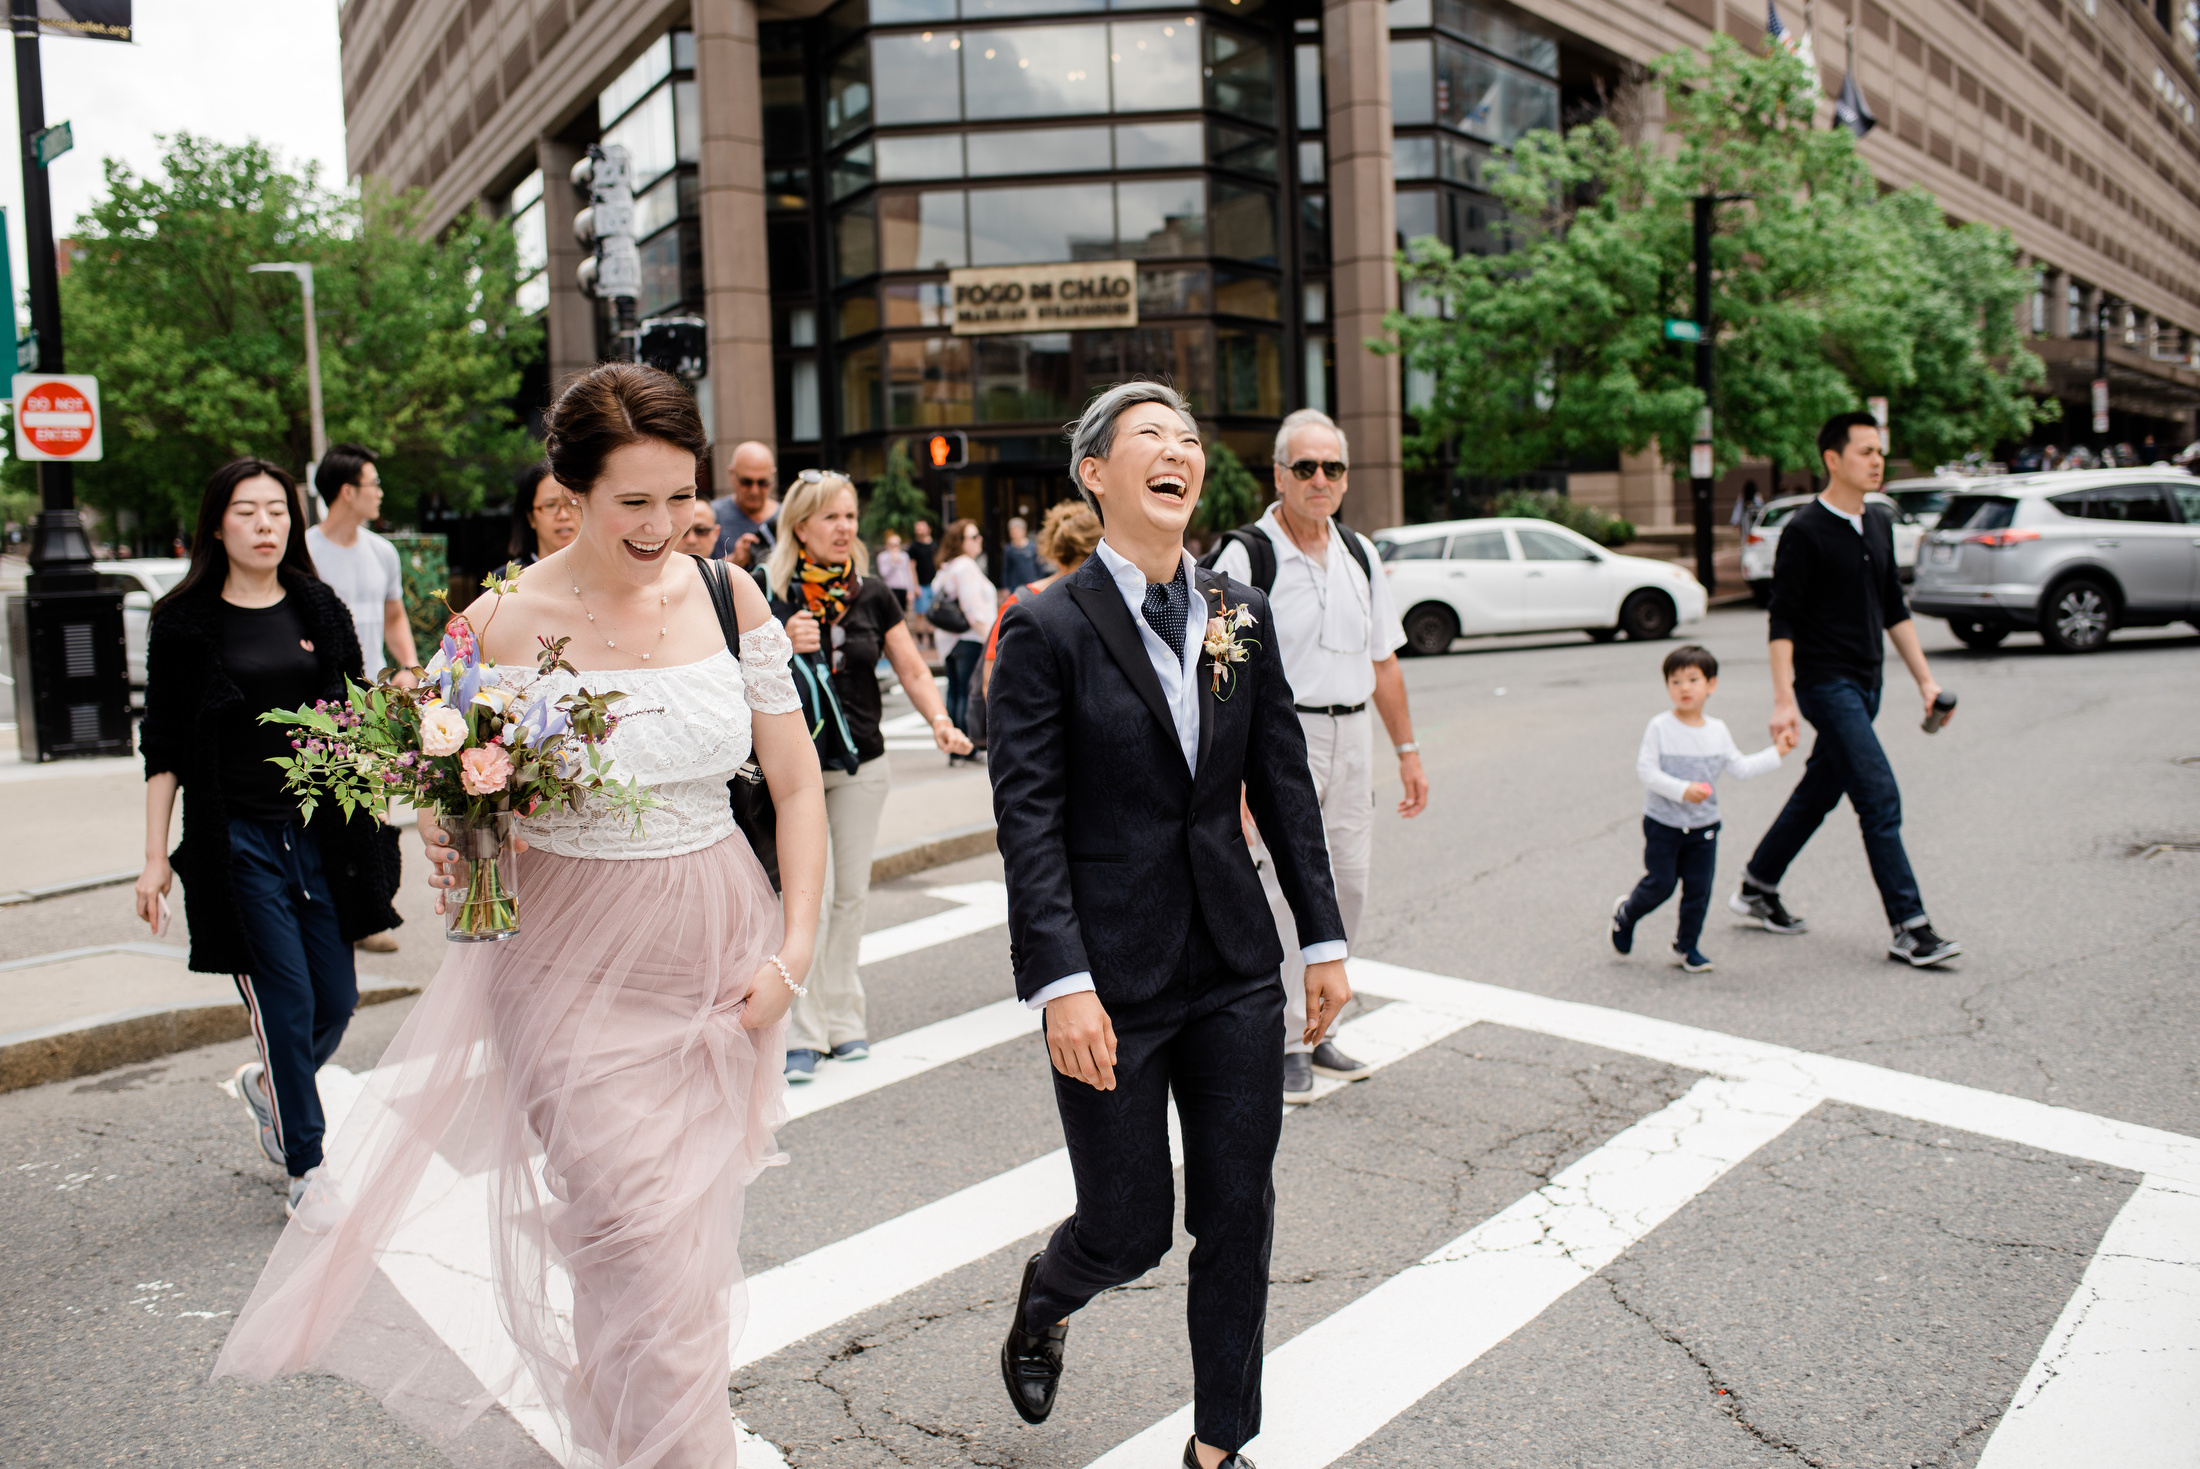 gibbet_hill_barn_same_sex_wedding_photos_10.JPG